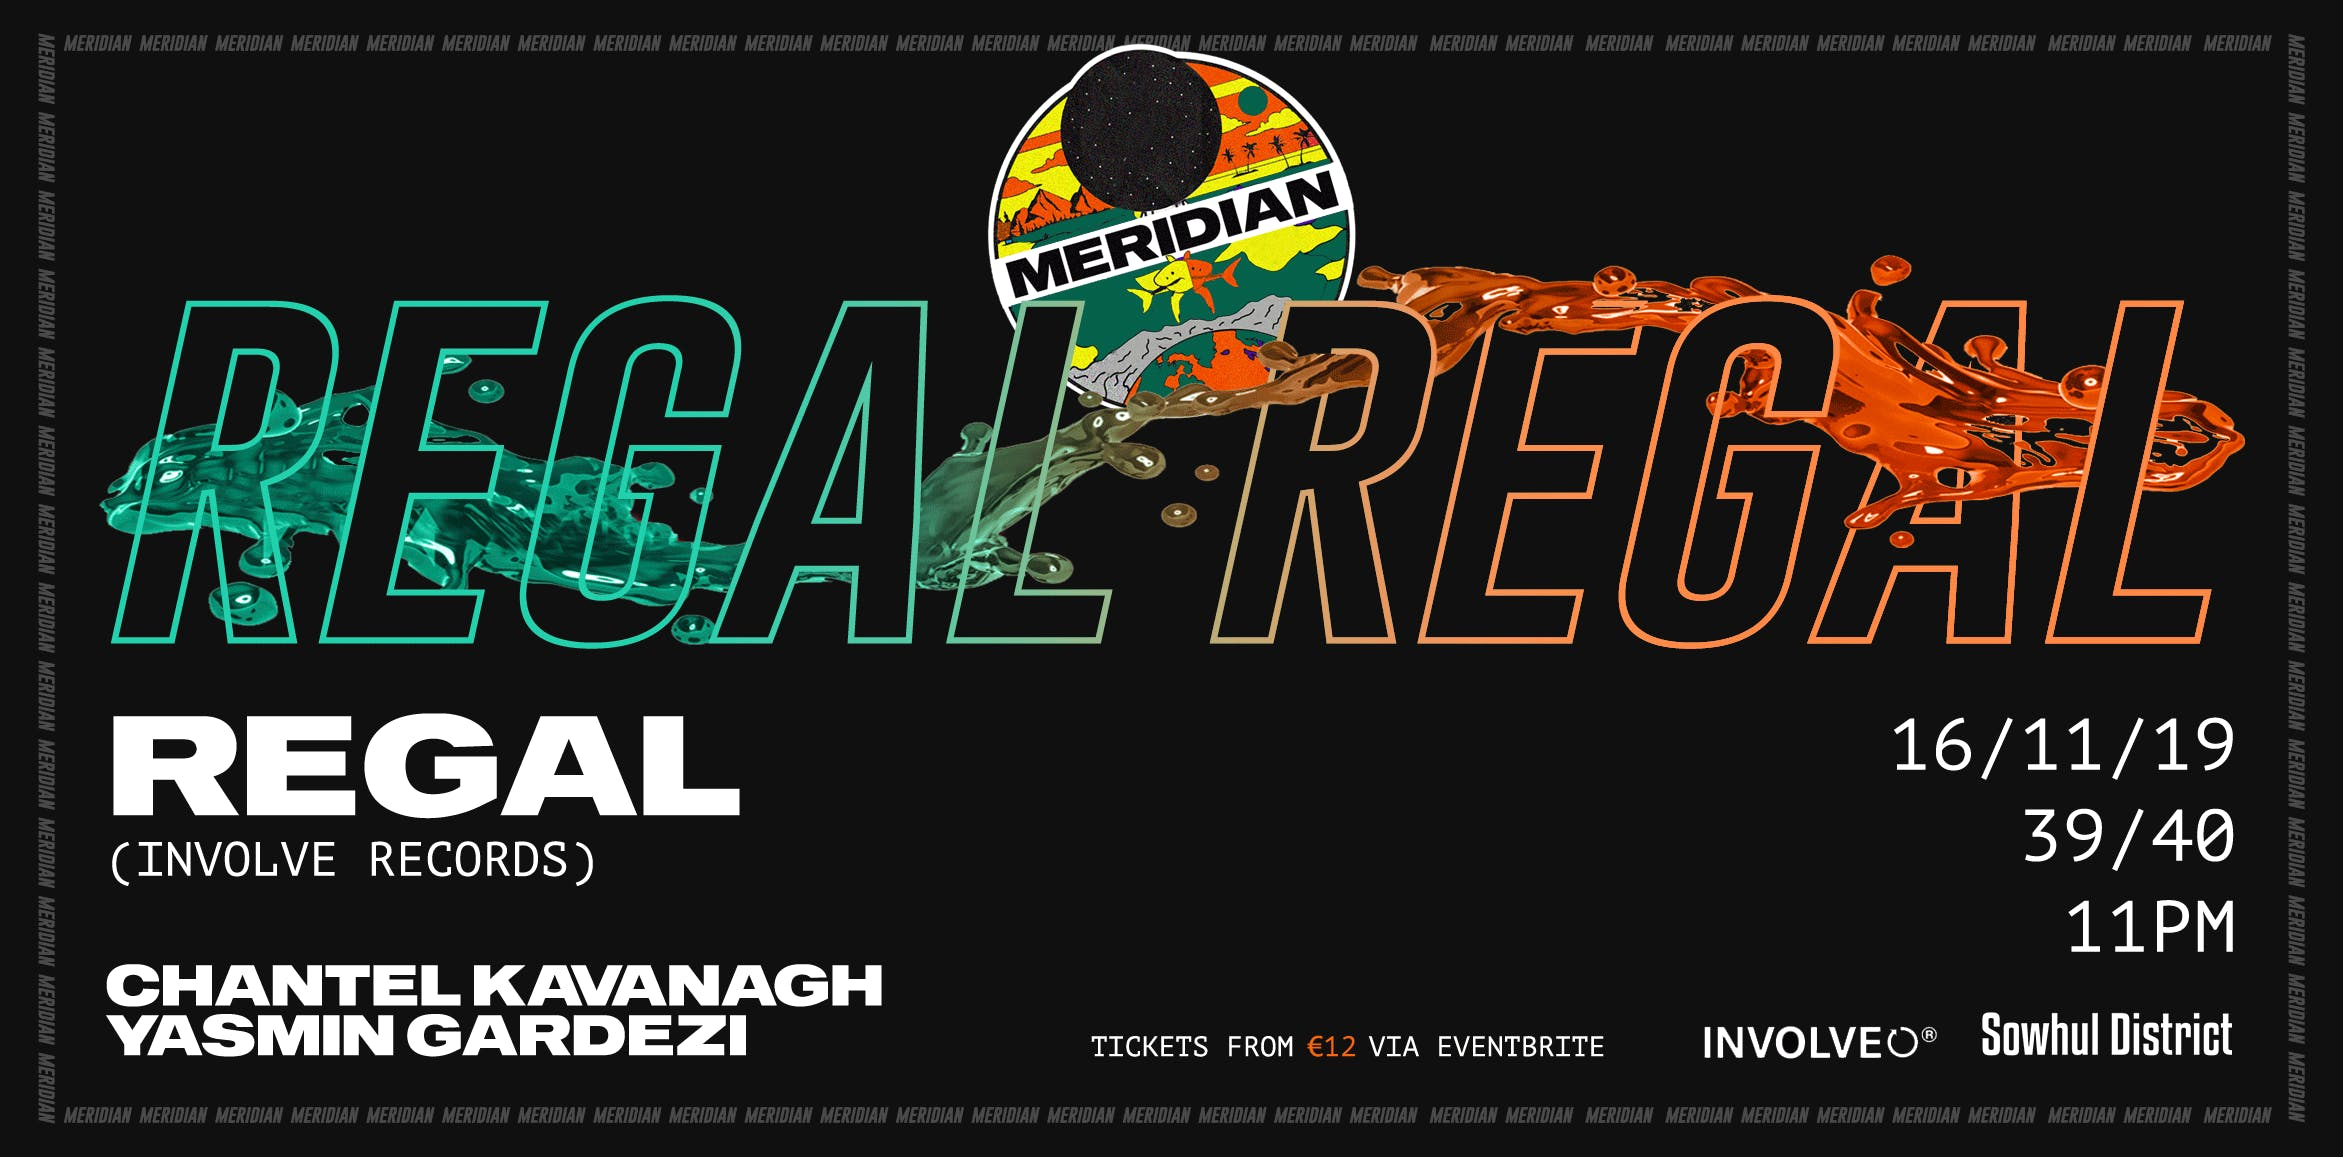 Meridian Presents : Regal at 39/40